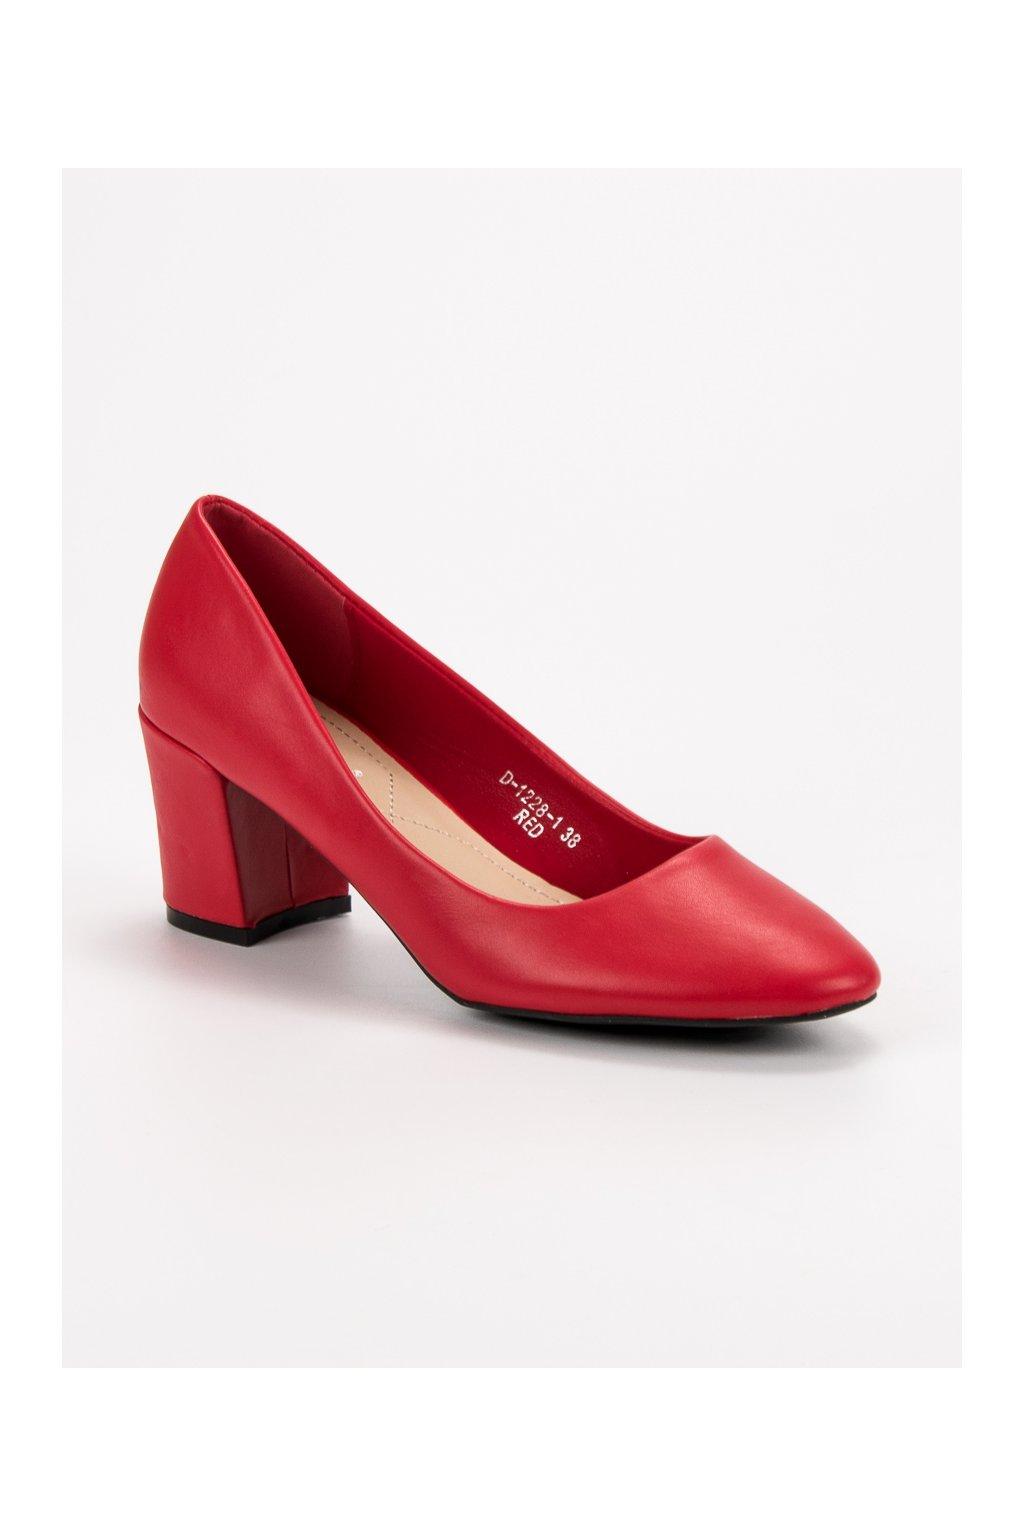 Klasické červené lodičky Ideal Shoes D-1228-1R  0e909a78d2